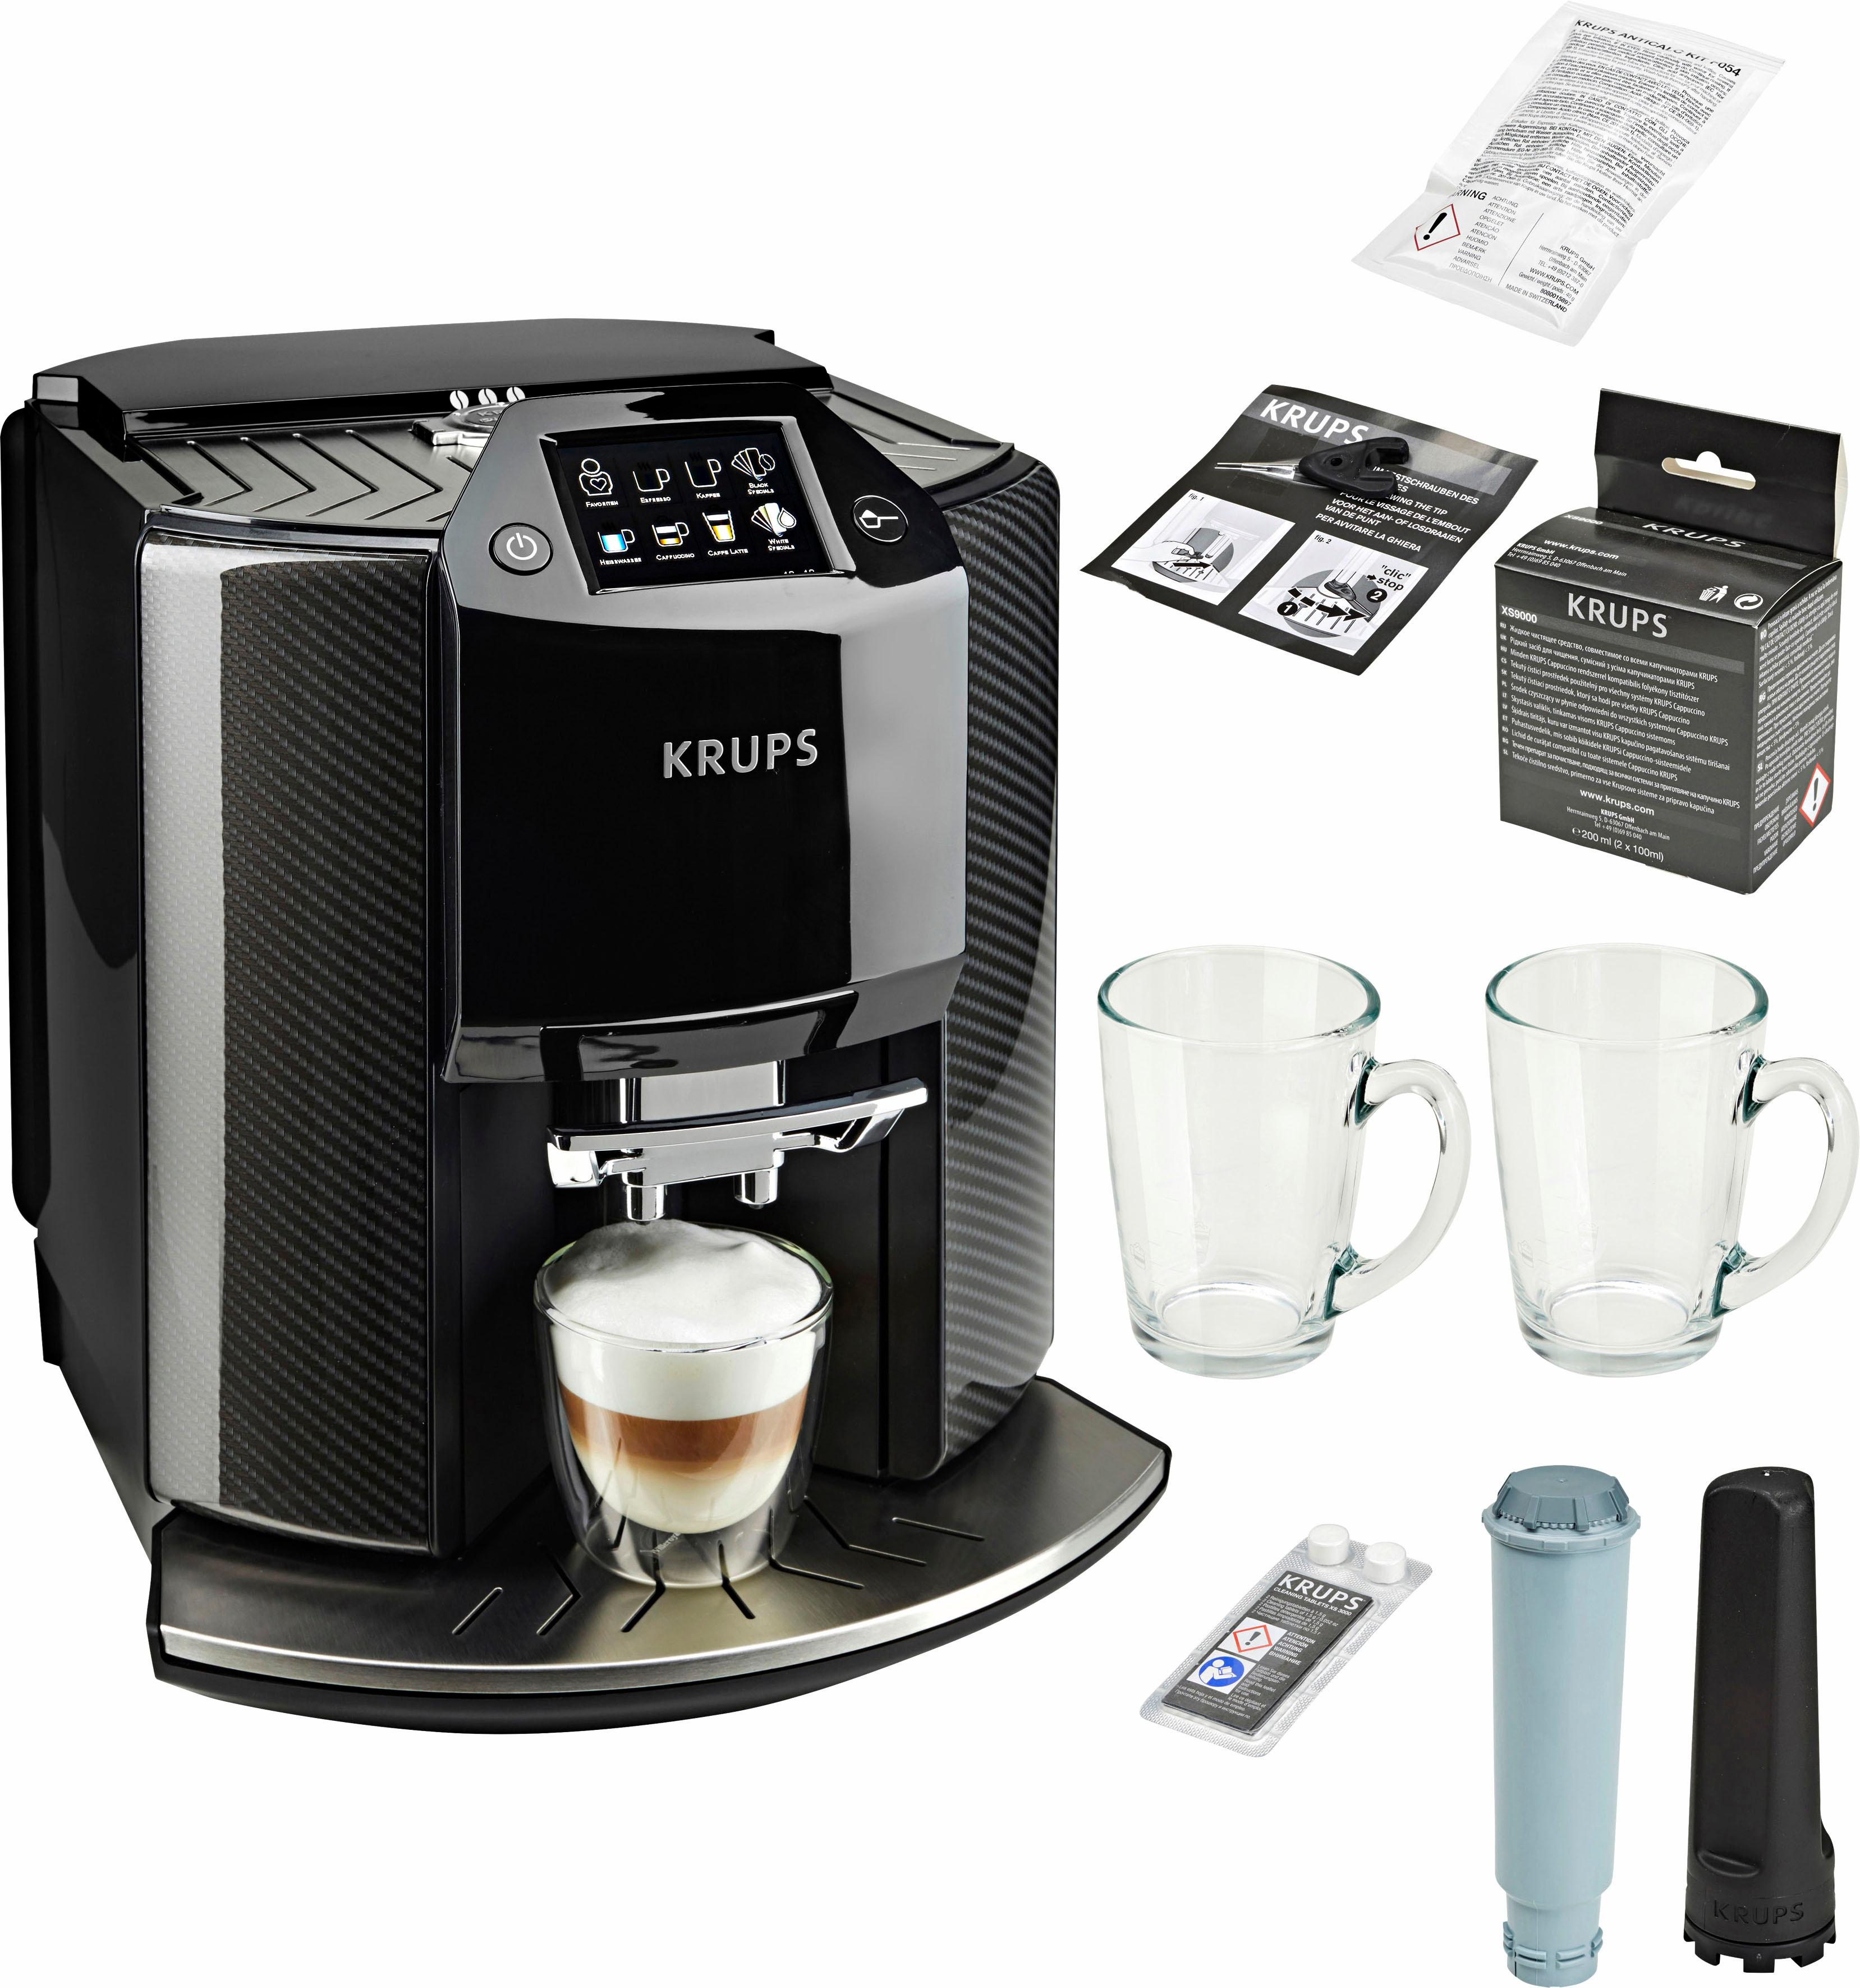 Krups Kaffeevollautomat EA9078 Barista New Age, Carbon, Espresso-Vollautomat, 1,9l Tank, Kegelmahlwerk | Küche und Esszimmer > Kaffee und Tee > Kaffeevollautomaten | Schwarz | KRUPS